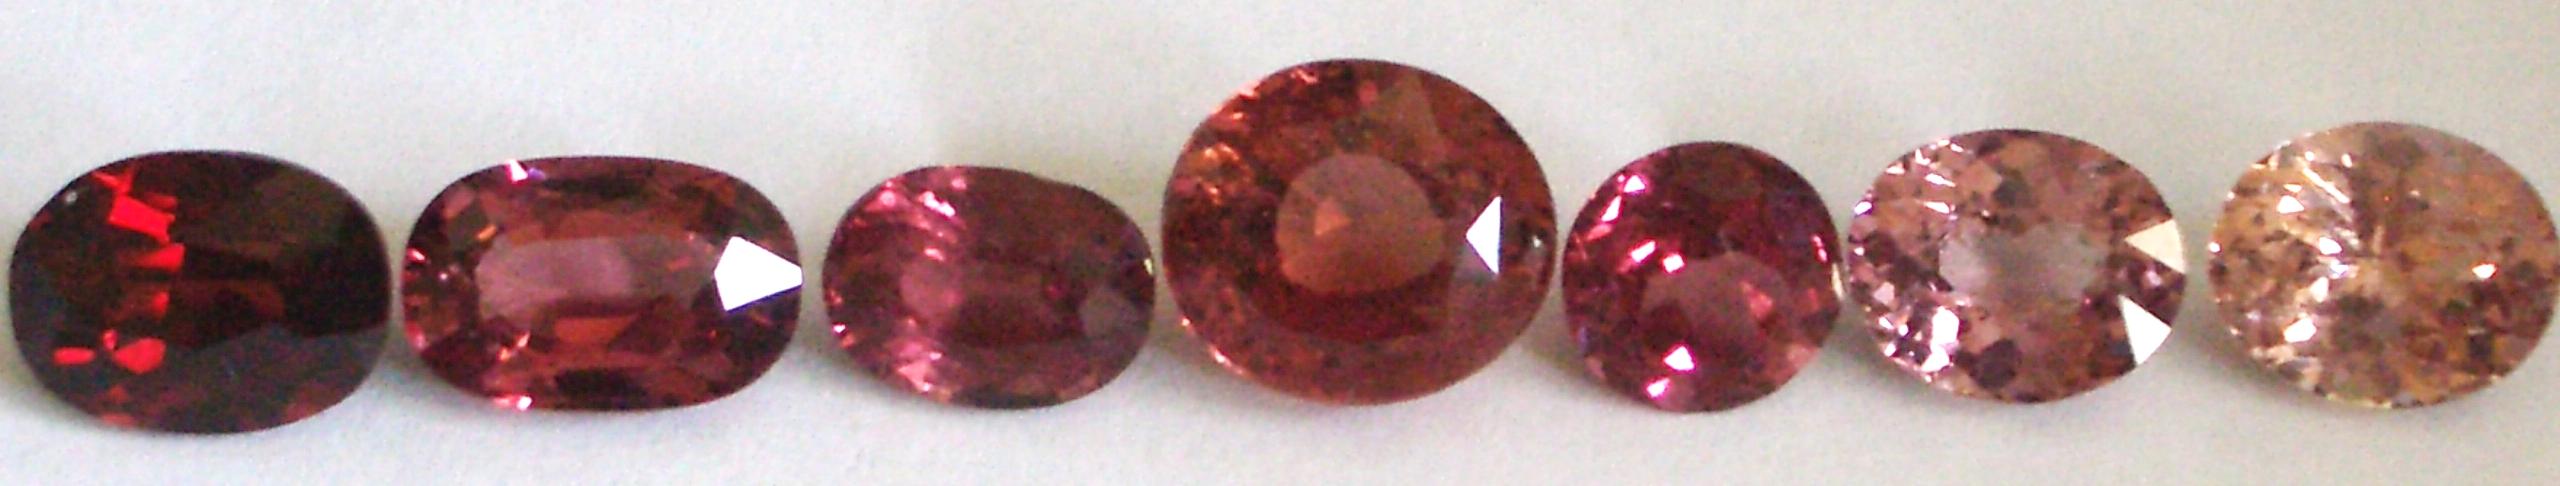 Spearating Look-alike Gems